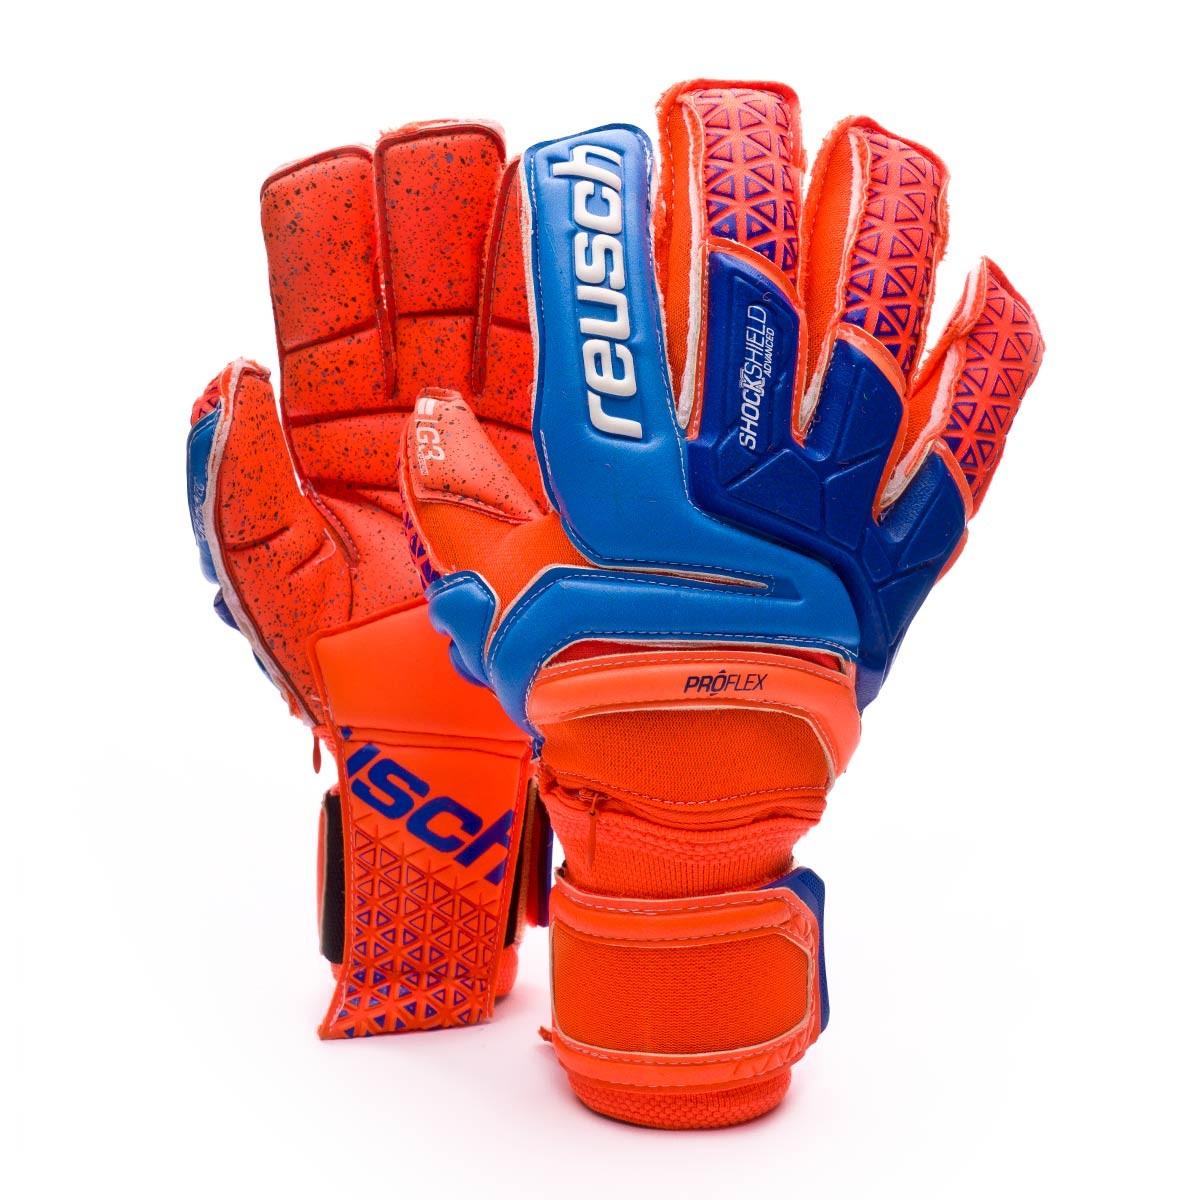 7f10c8cebf8 Glove Reusch Prisma Supreme G3 Fusion Ortho-Tec Shocking orange-Blue-Shocking  orange - Football store Fútbol Emotion